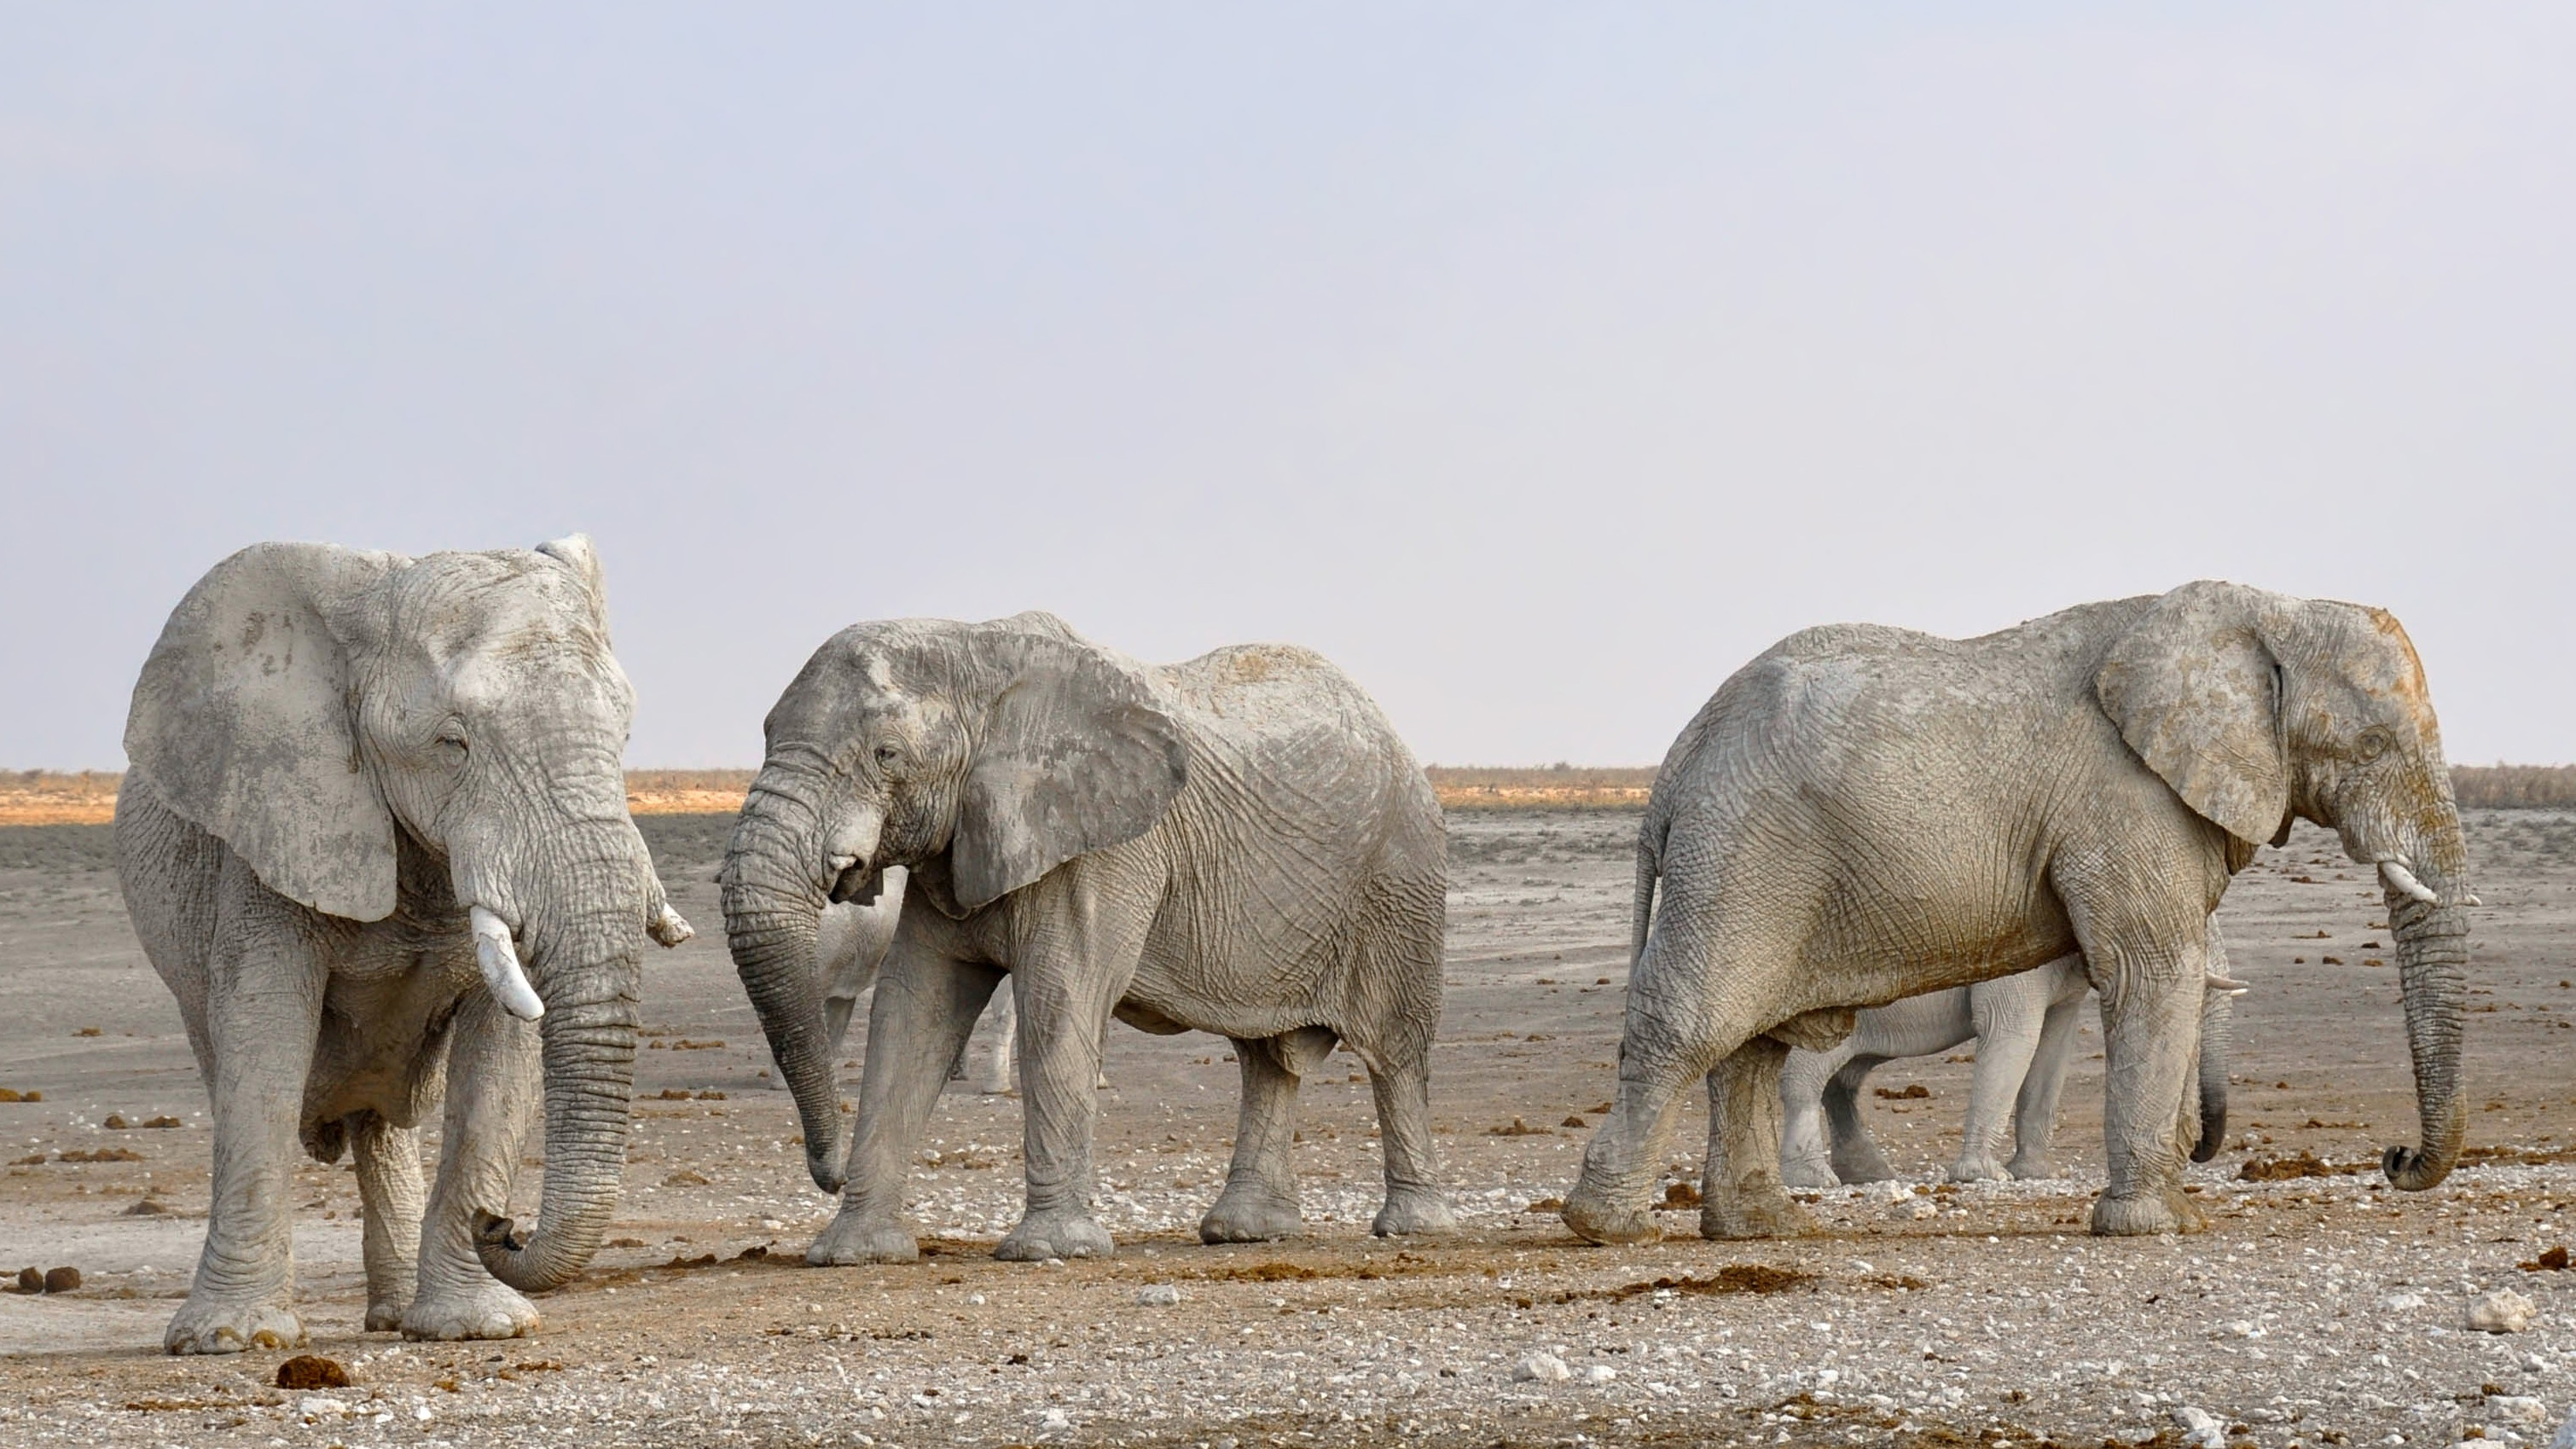 nature-adventure-animal-dry-wildlife-herd-827728-pxhere.com